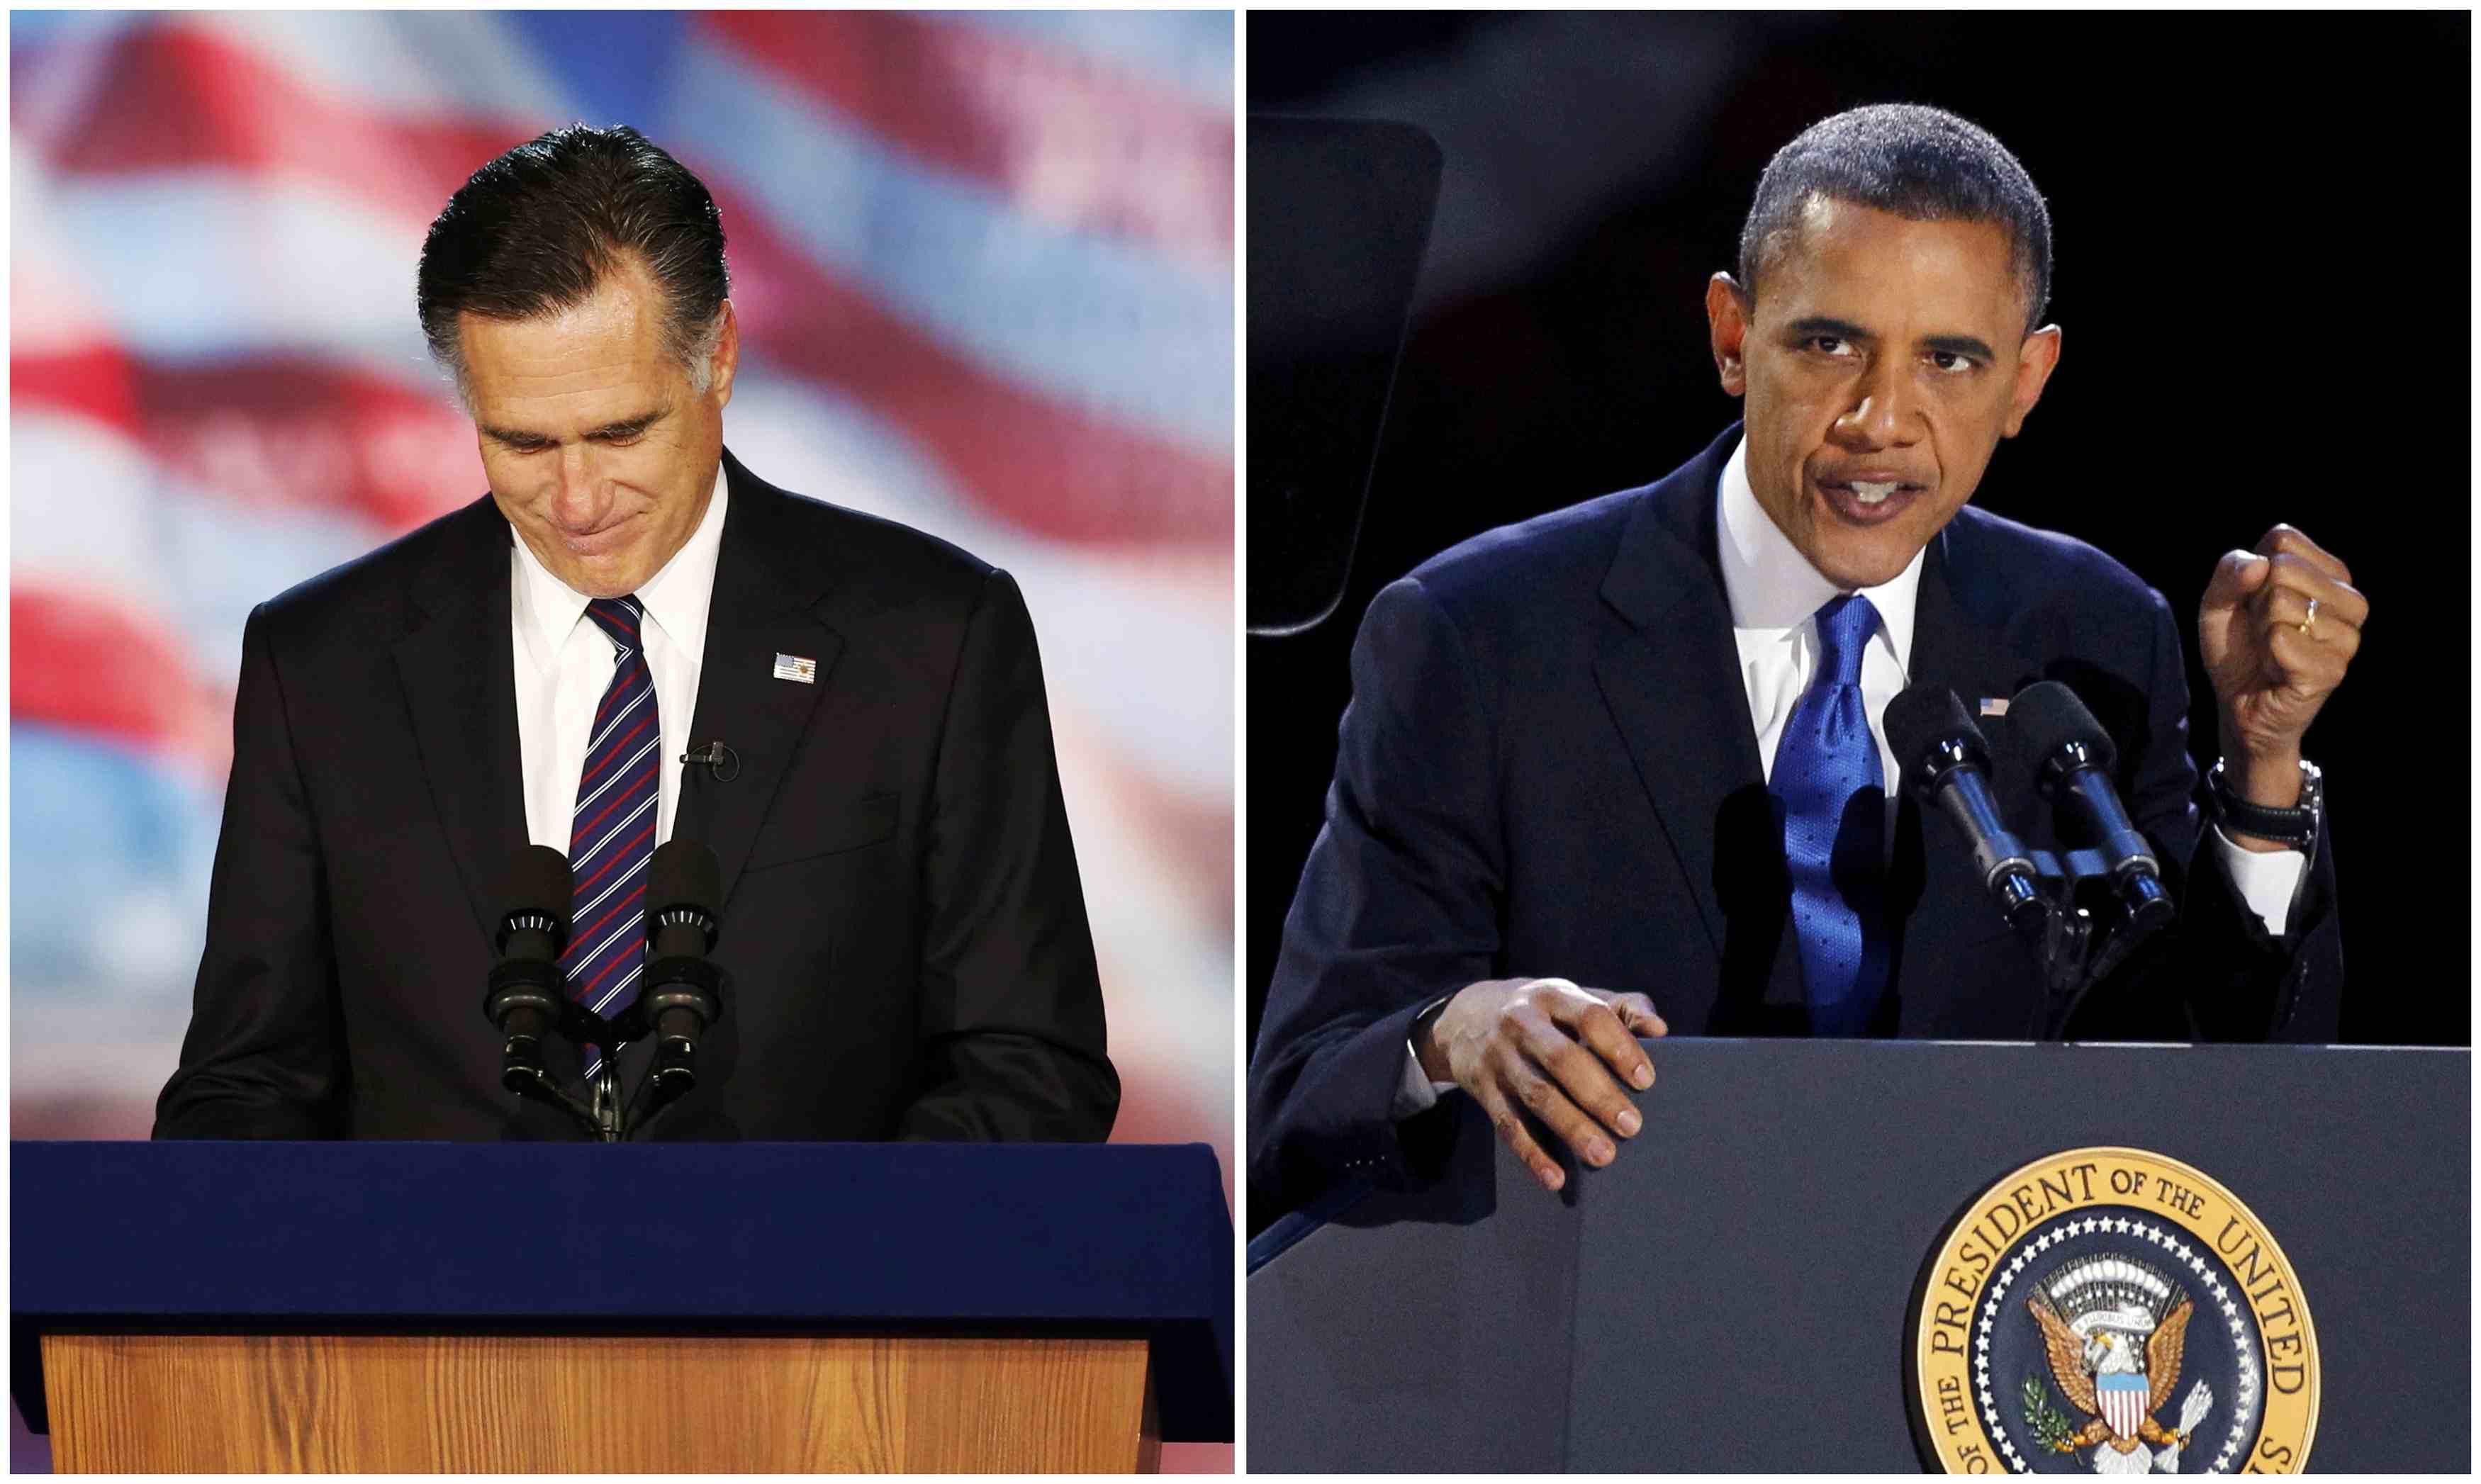 Expert – Romney Win Would Have Been 'Catastrophic'